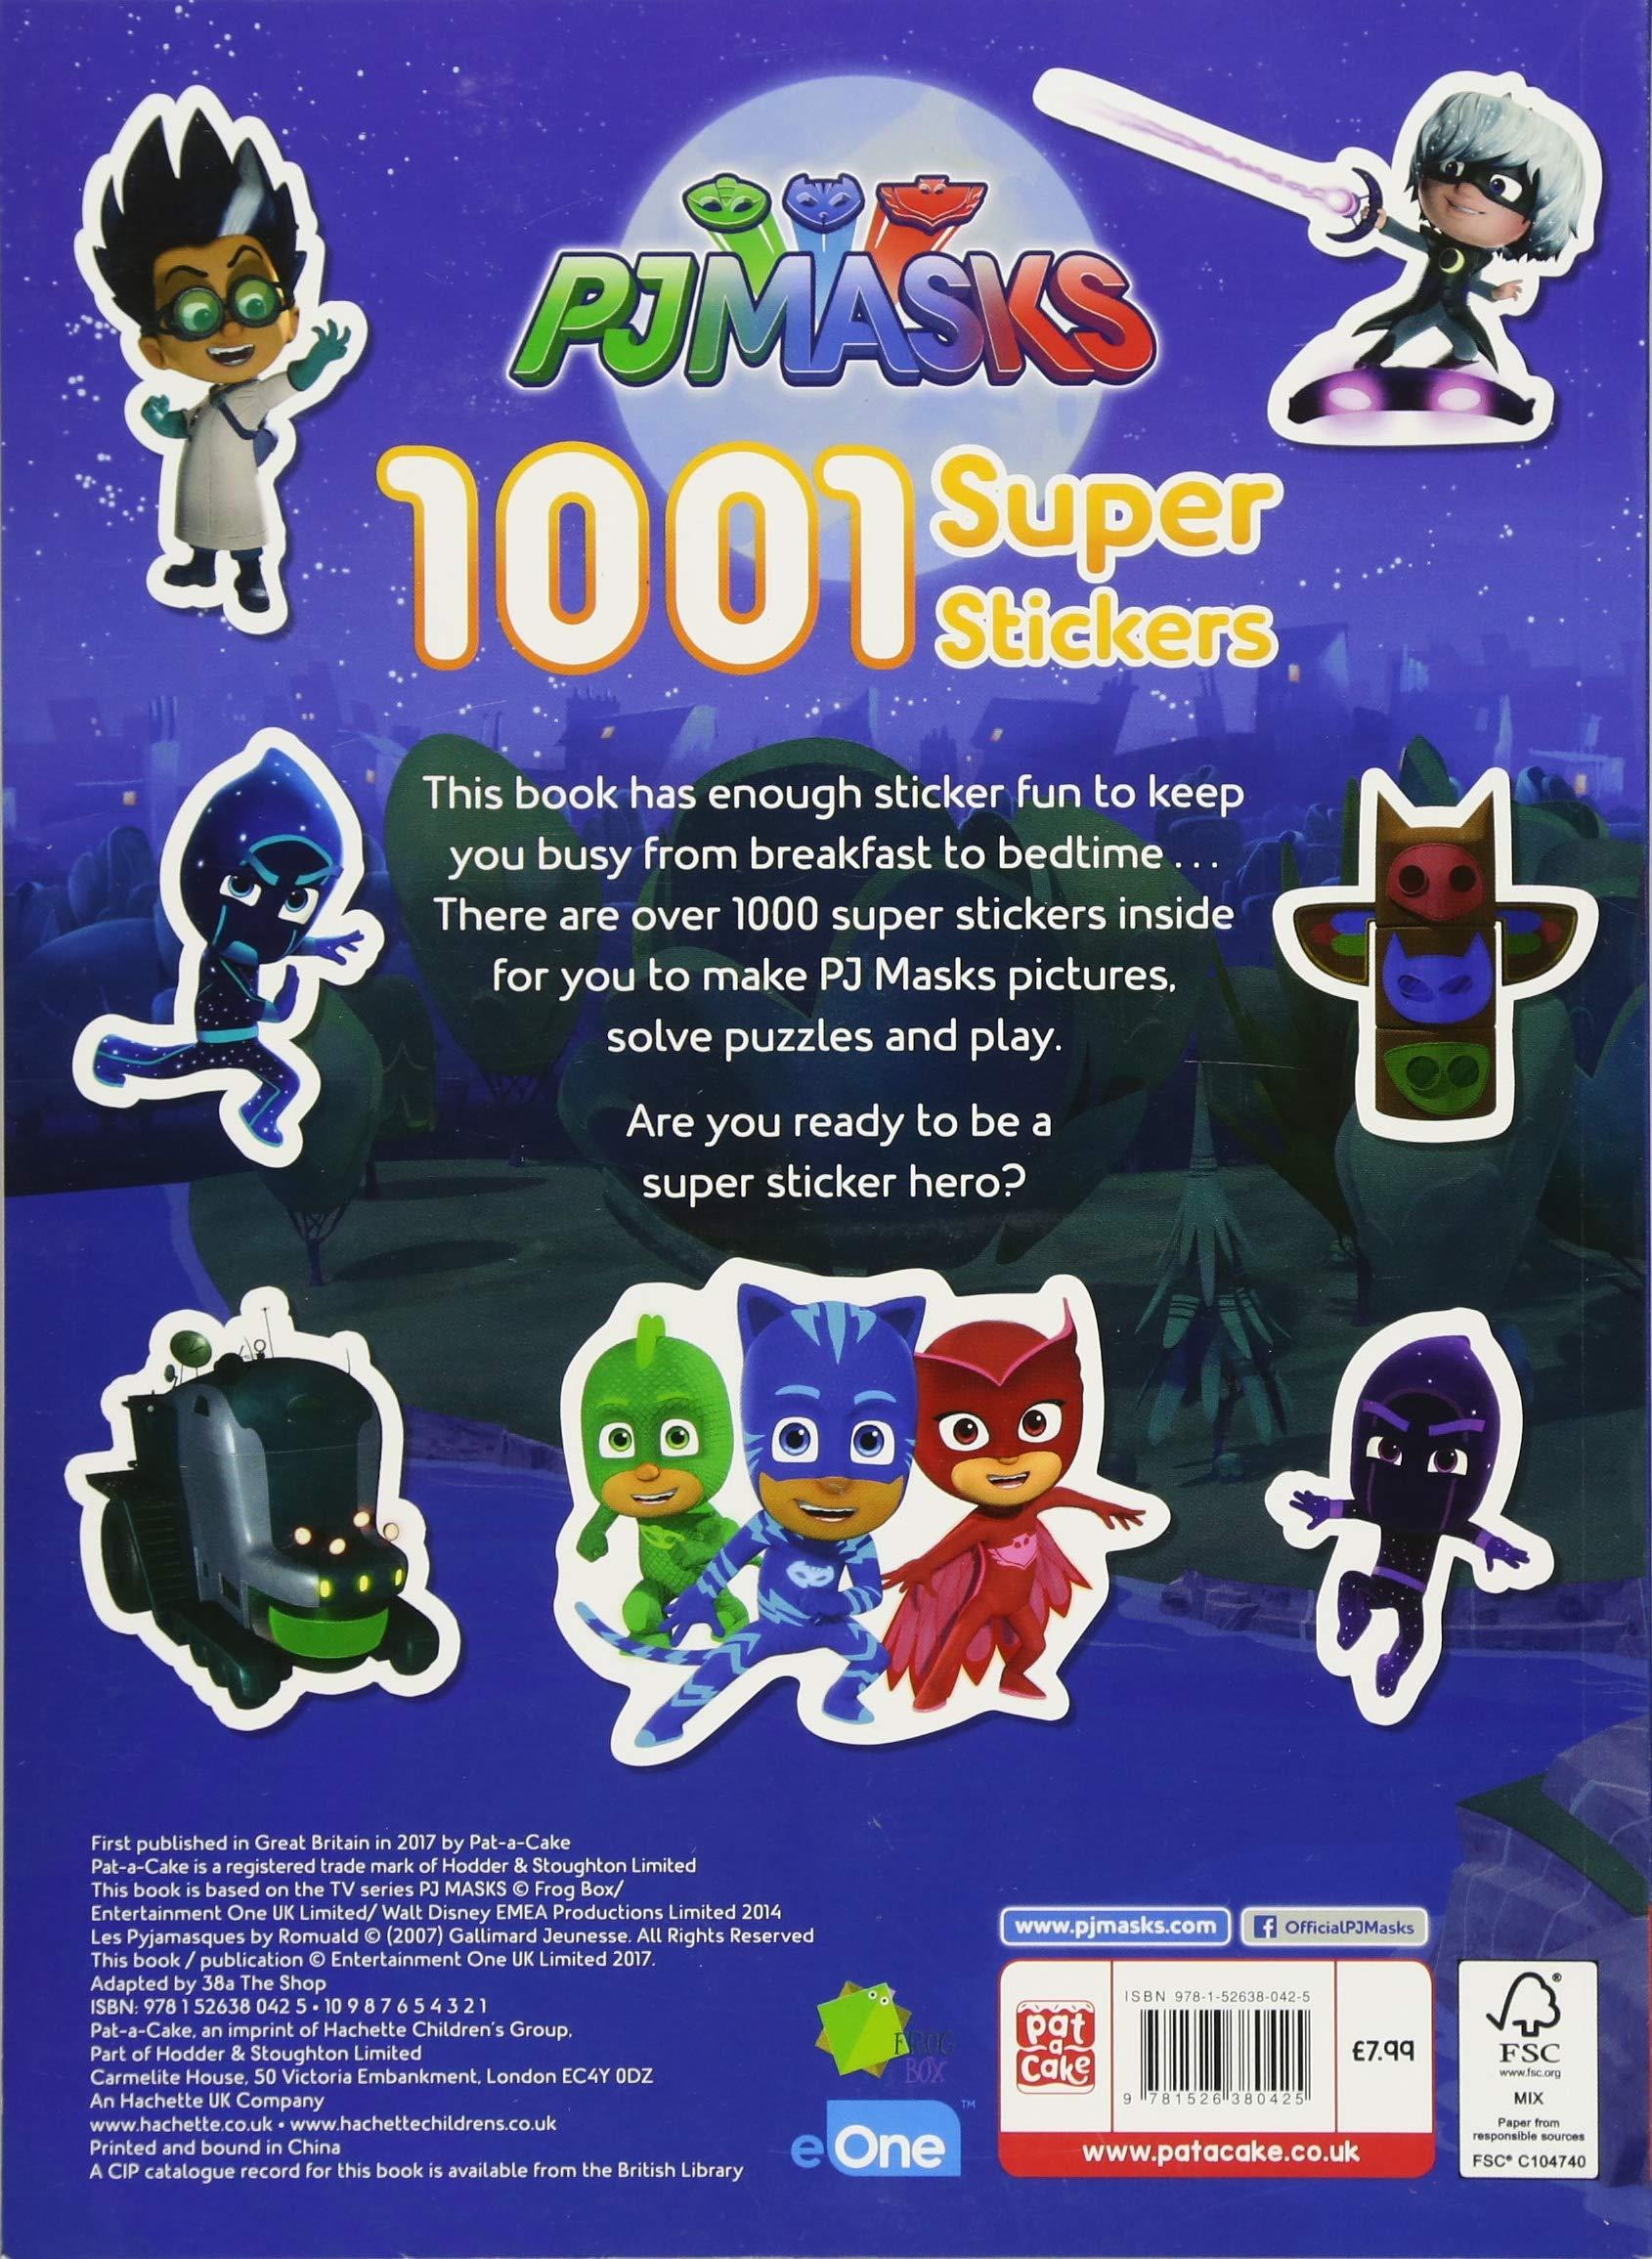 1001 Super Stickers (PJ Masks): Amazon.es: Pat-a-Cake, PJ Masks: Libros en idiomas extranjeros